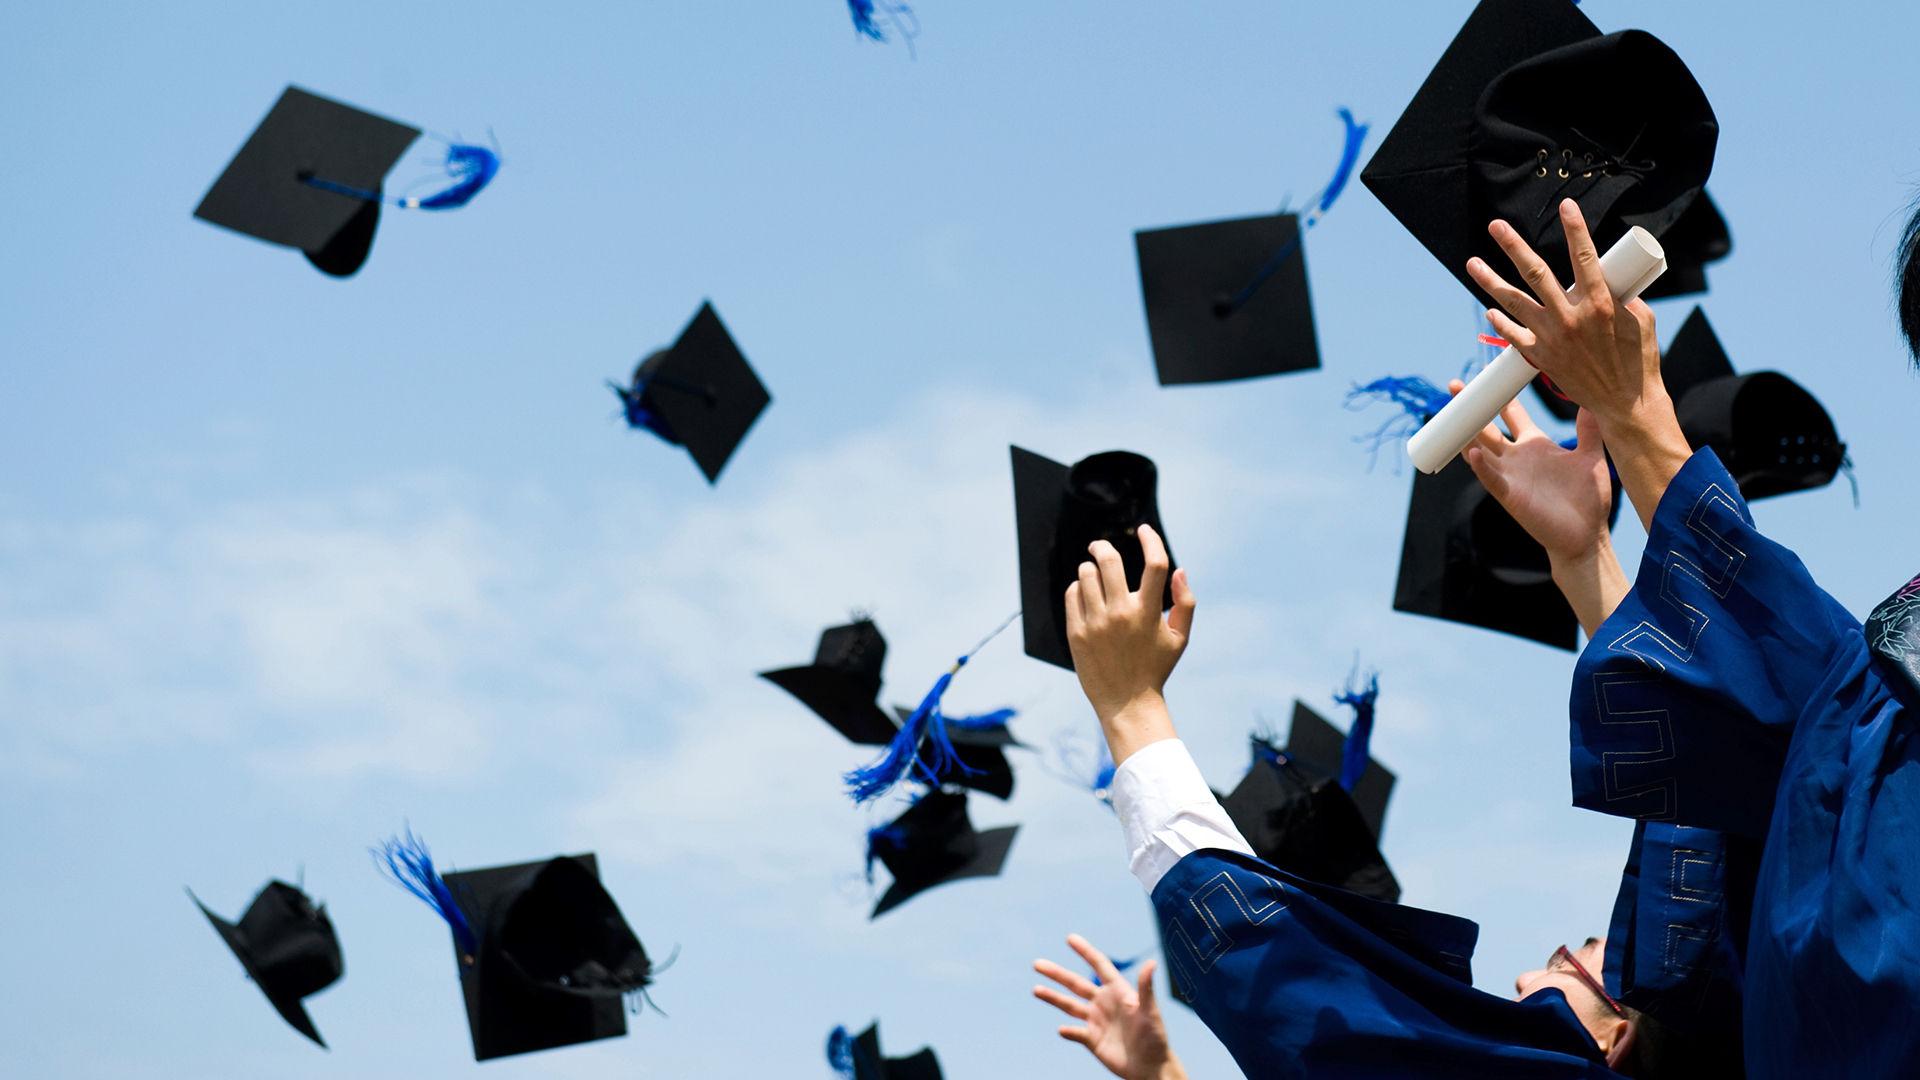 Graduation caps in air | Sheknows.com